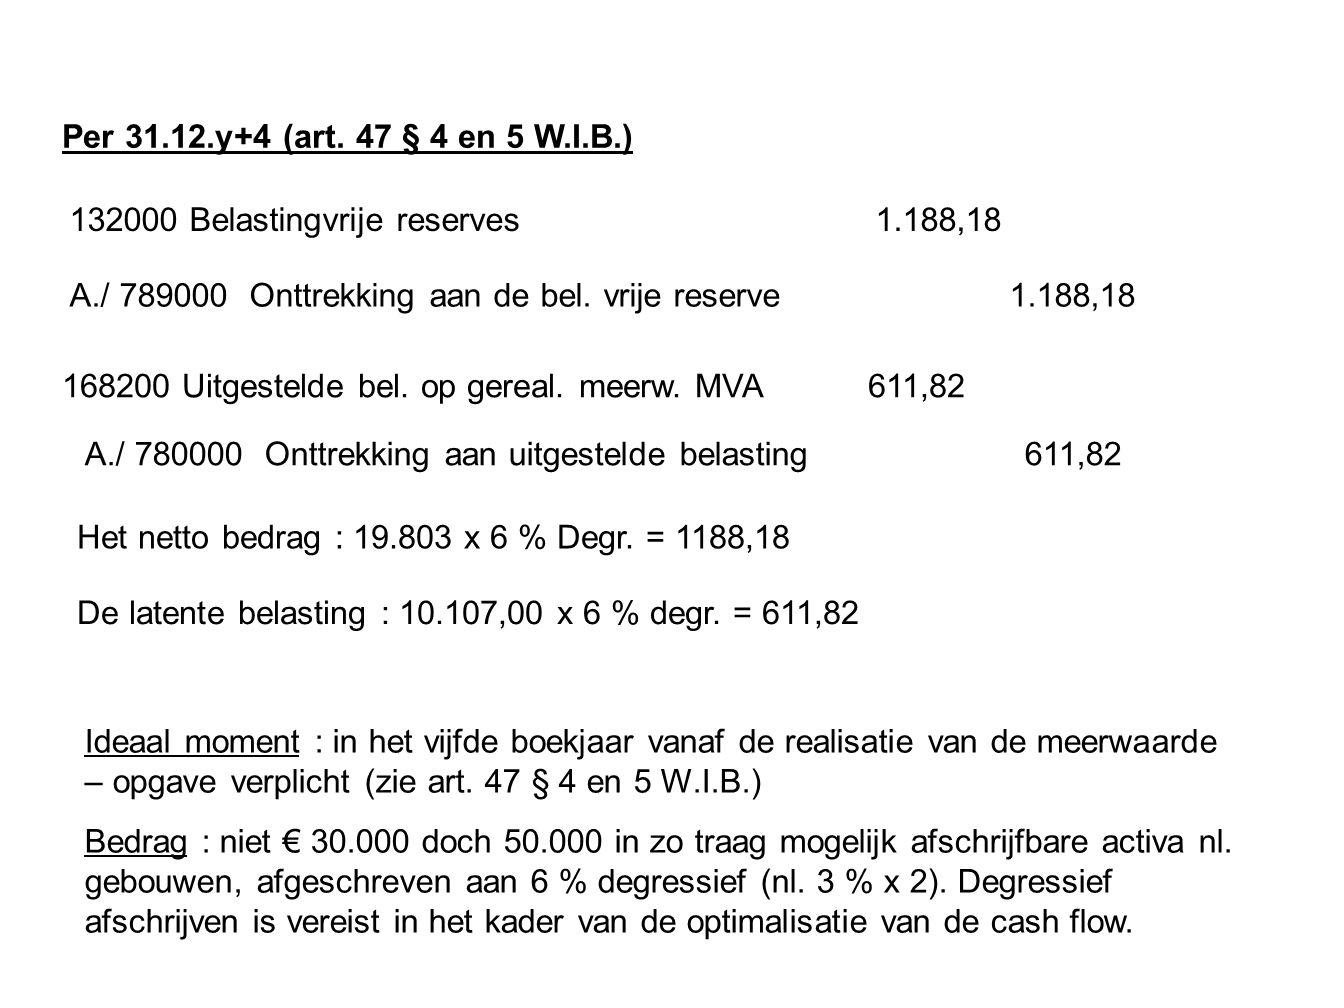 Per 31.12.y+4 (art. 47 § 4 en 5 W.I.B.) 132000 Belastingvrije reserves 1.188,18 Het netto bedrag : 19.803 x 6 % Degr. = 1188,18 A./ 789000 Onttrekking